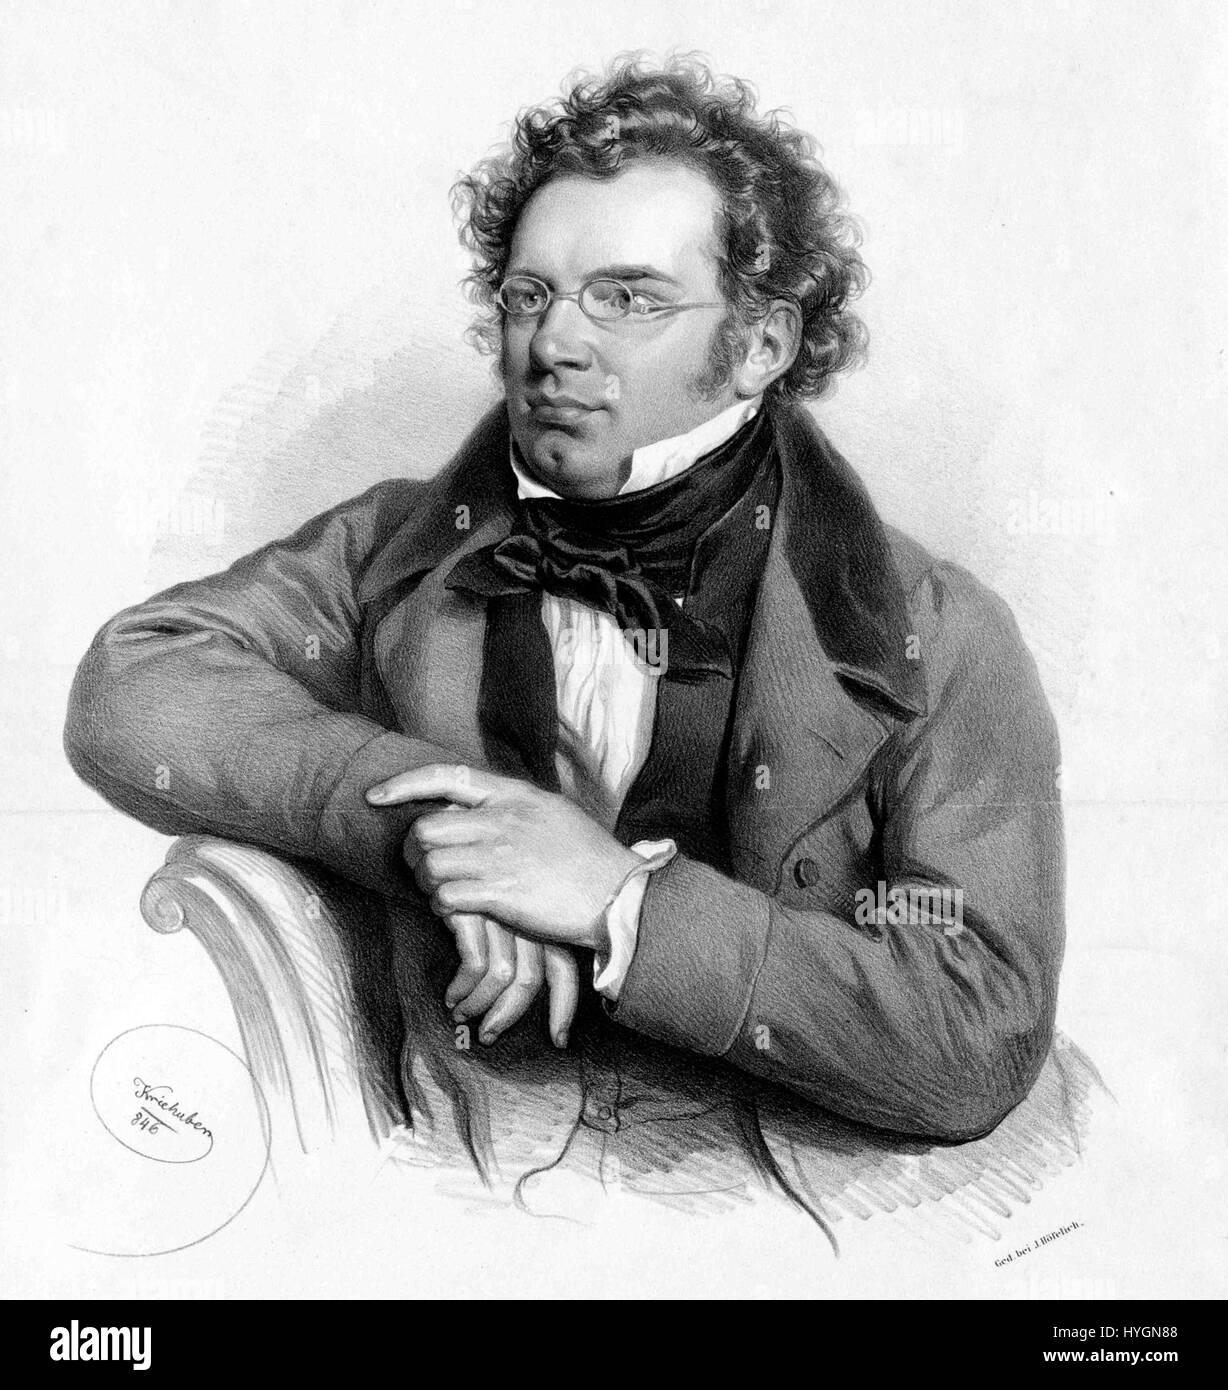 Austrian Composer Franz Schubert by Kriehuber Music Repro on Canvas or Paper